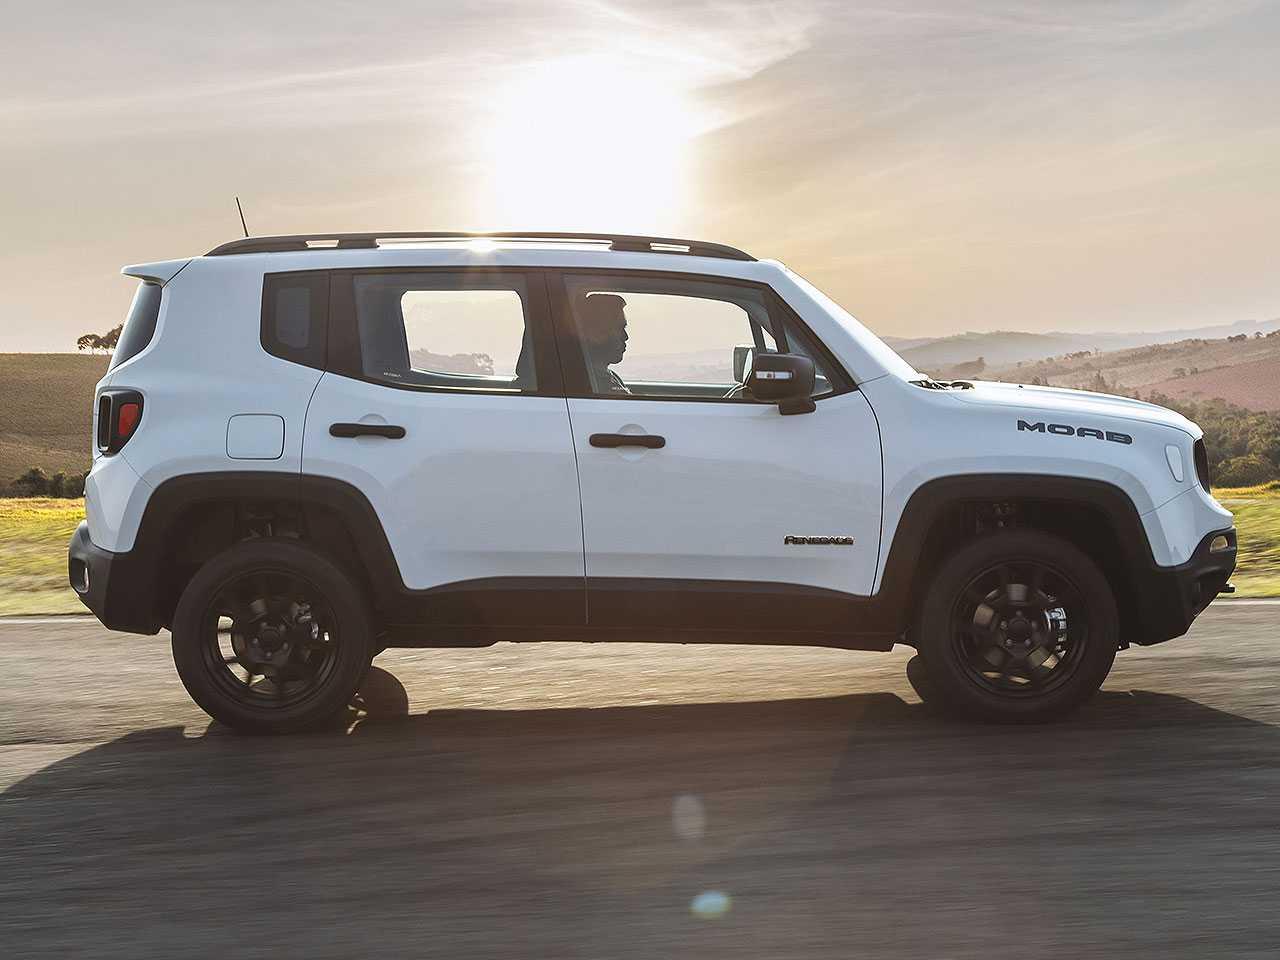 Futuro SUV pequeno da Jeep deverá manter o estilo robusto do Renegade